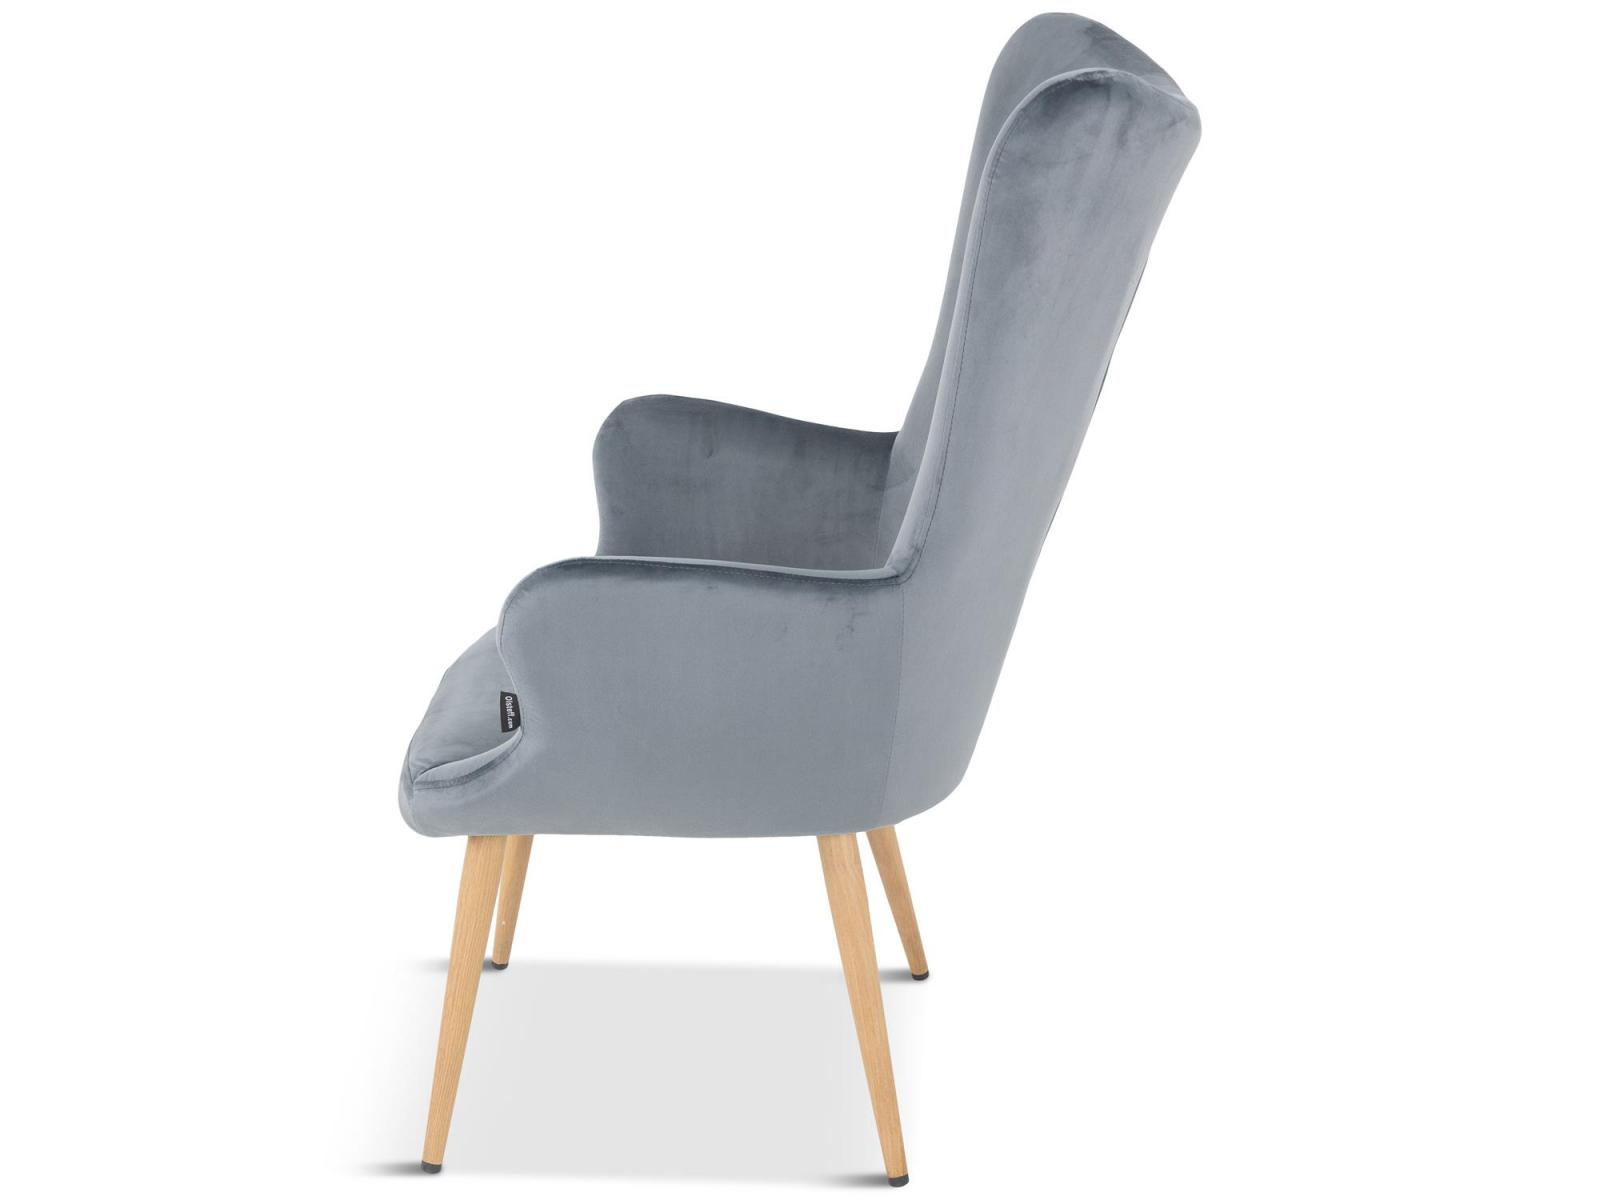 Welurowy fotel uszak